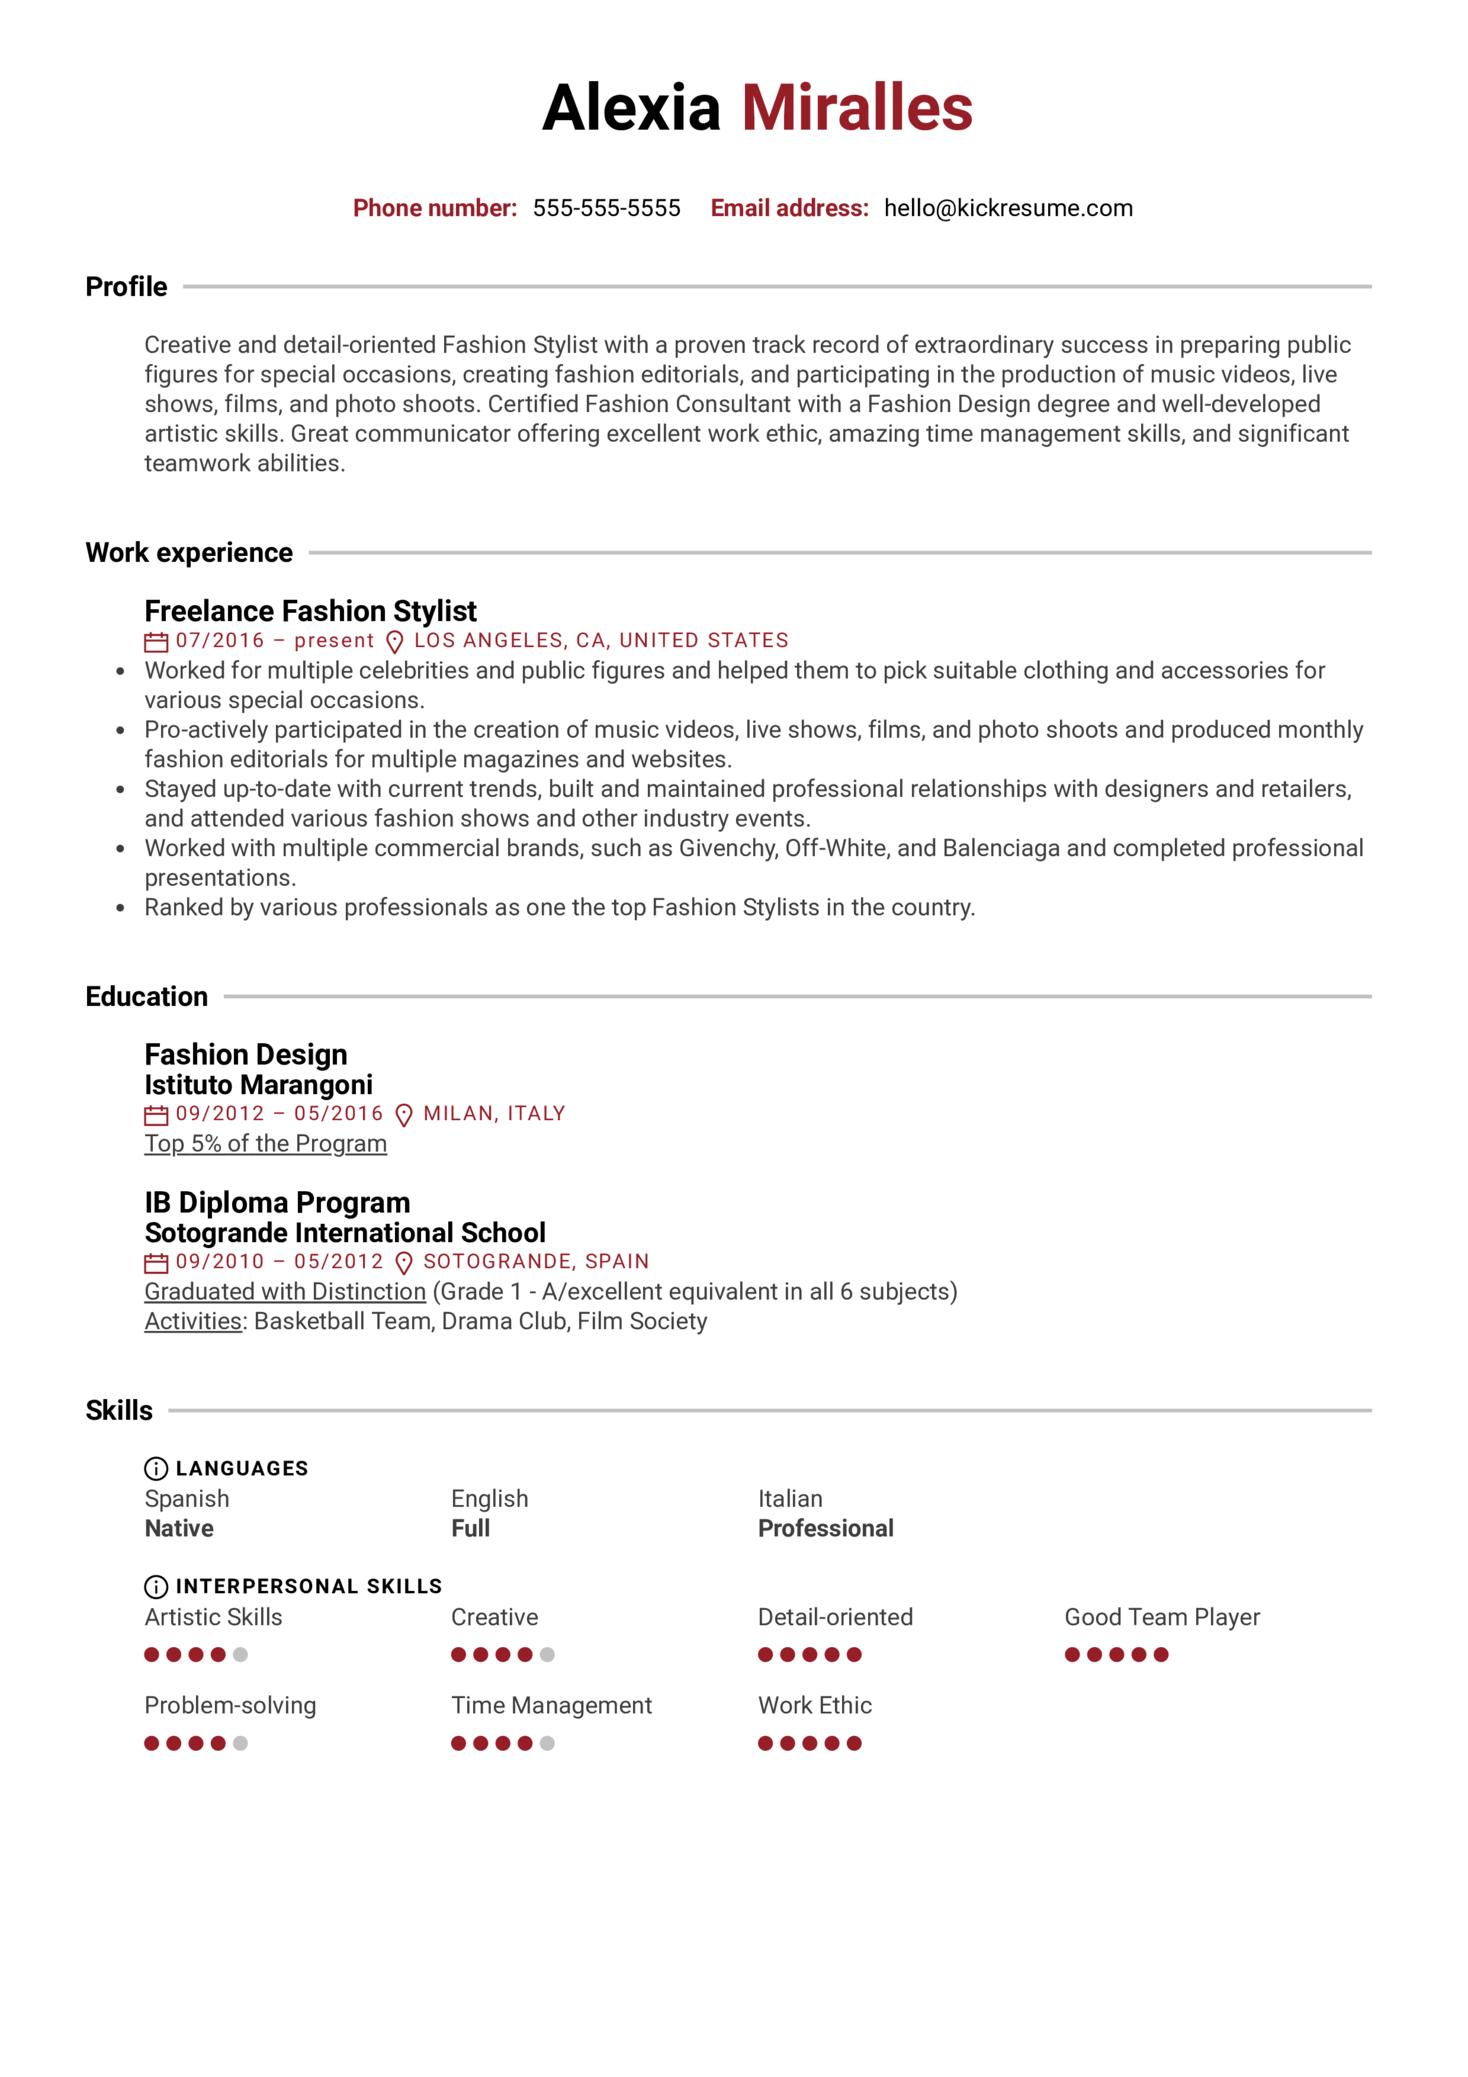 Fashion Stylist Resume Example (parte 1)